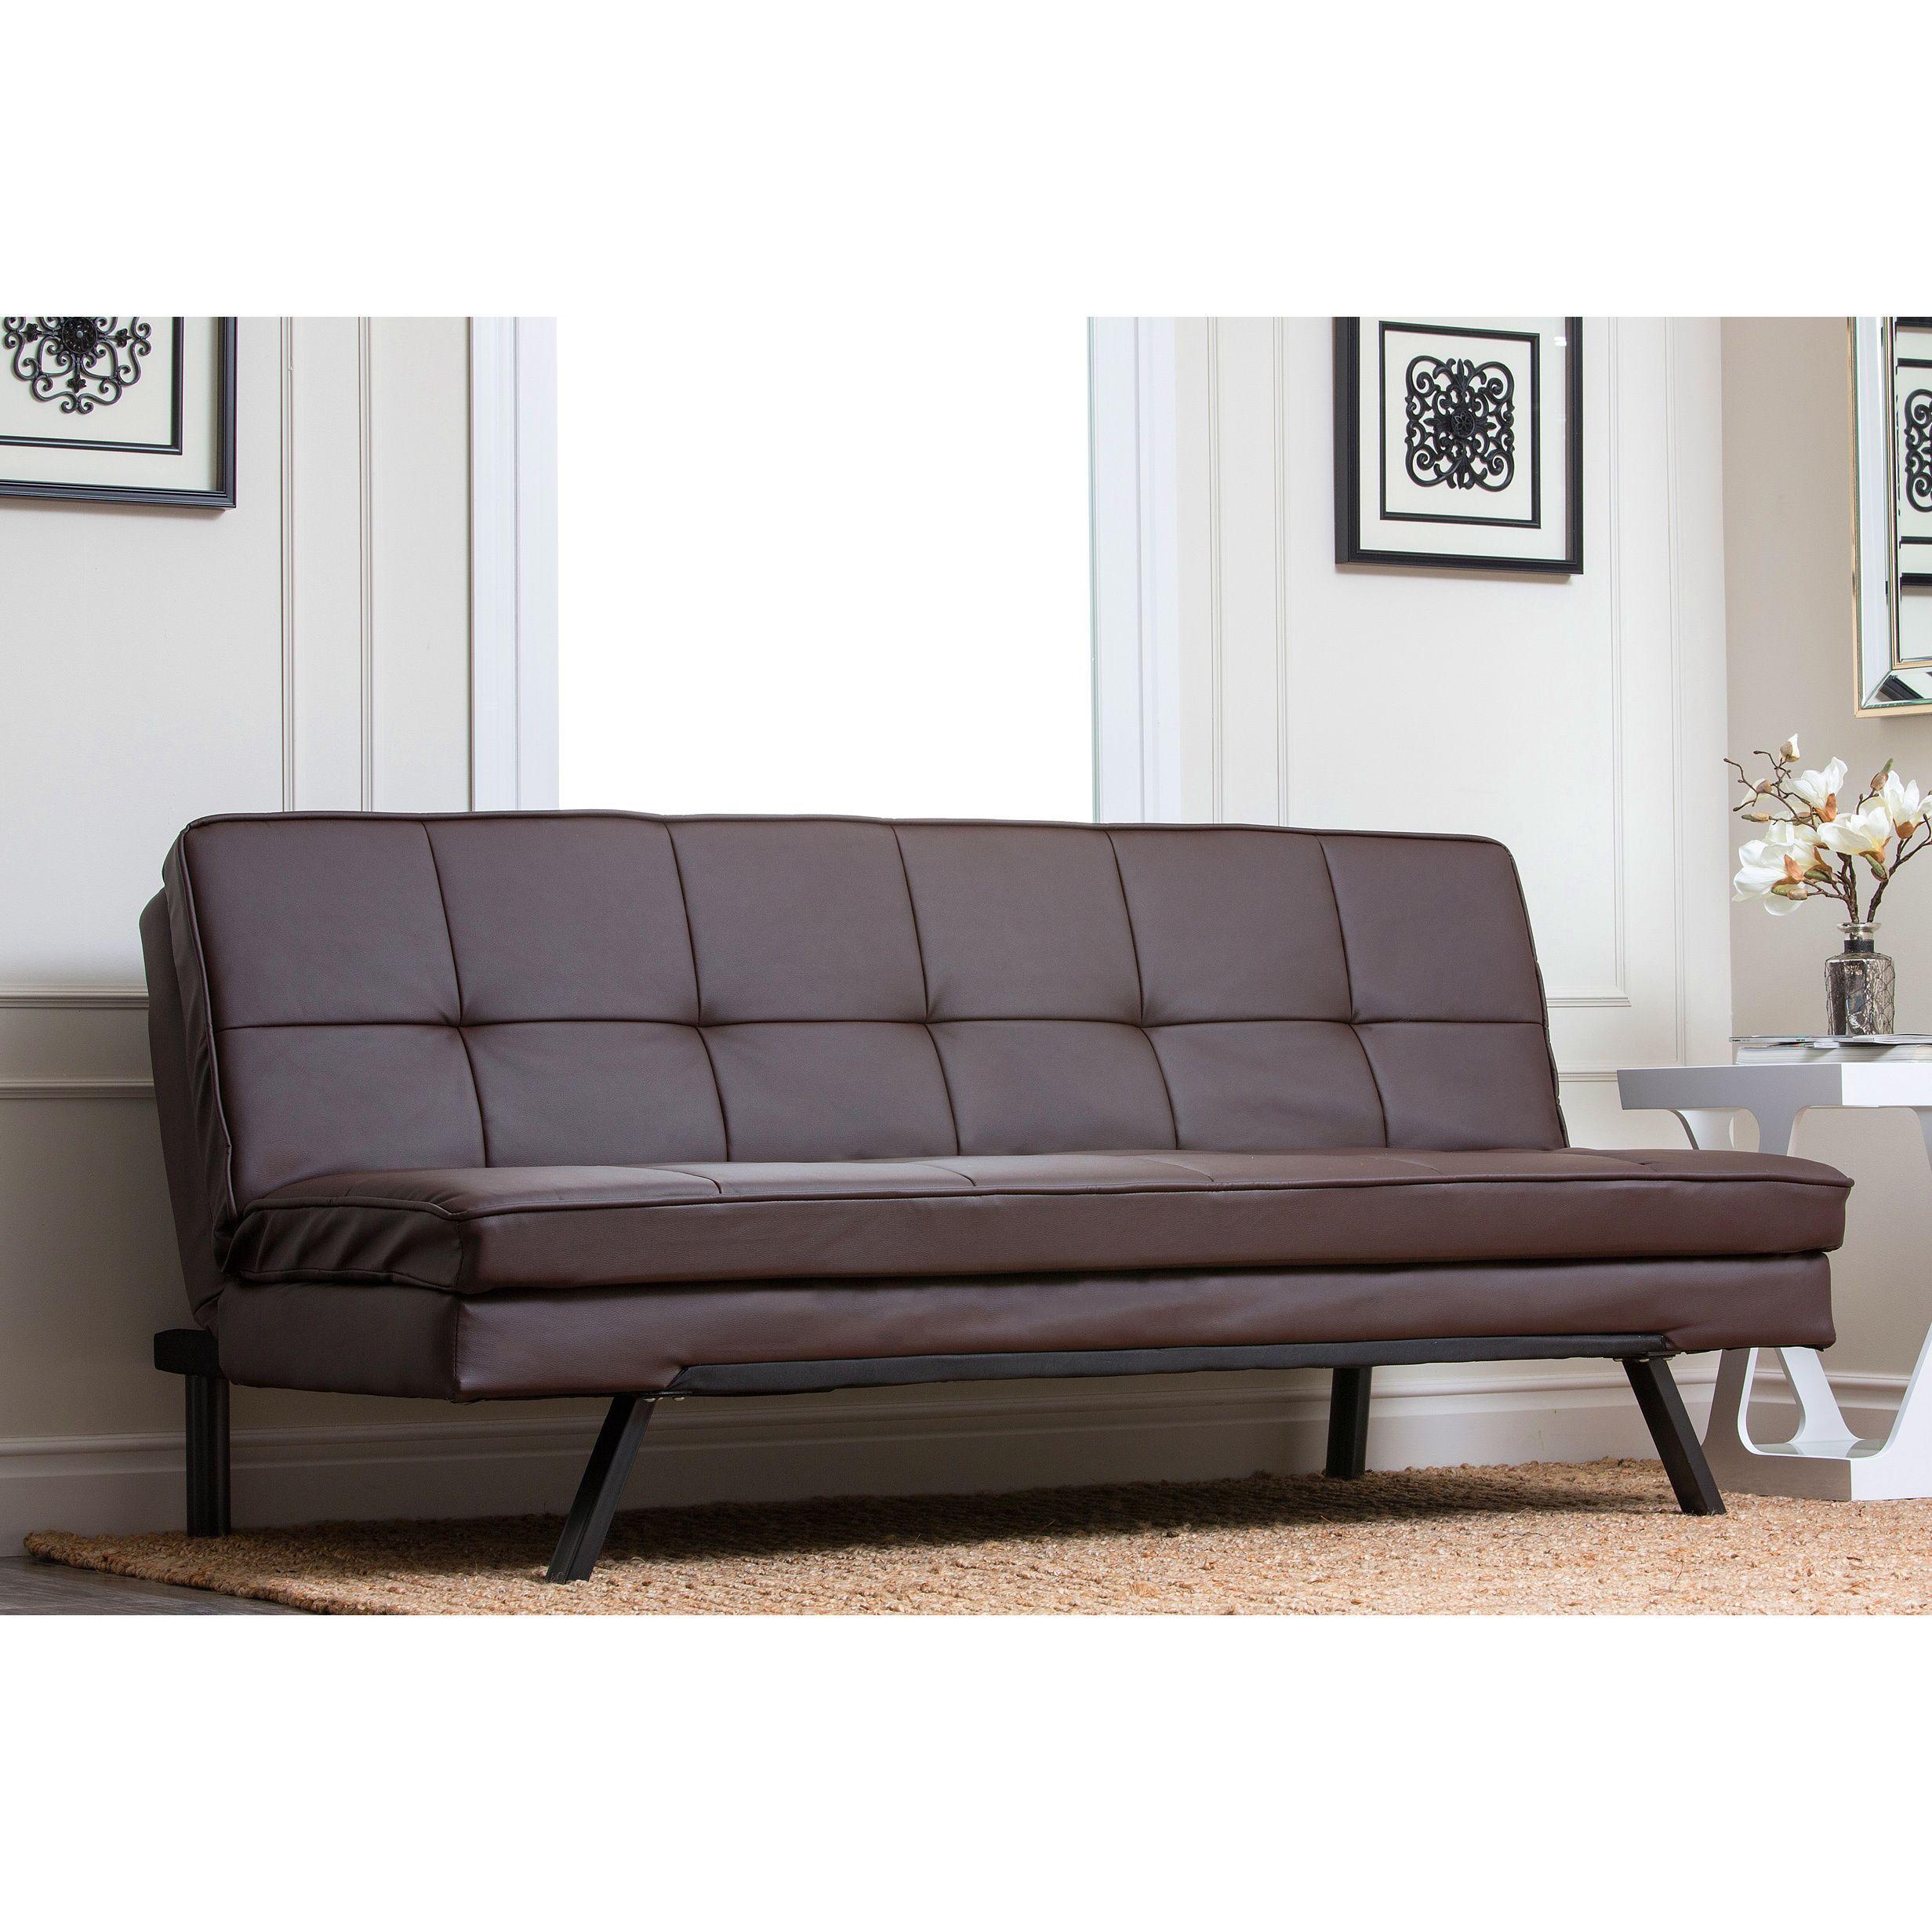 Abbyson Newport Faux Leather Futon Sleeper Sofa by Abbyson